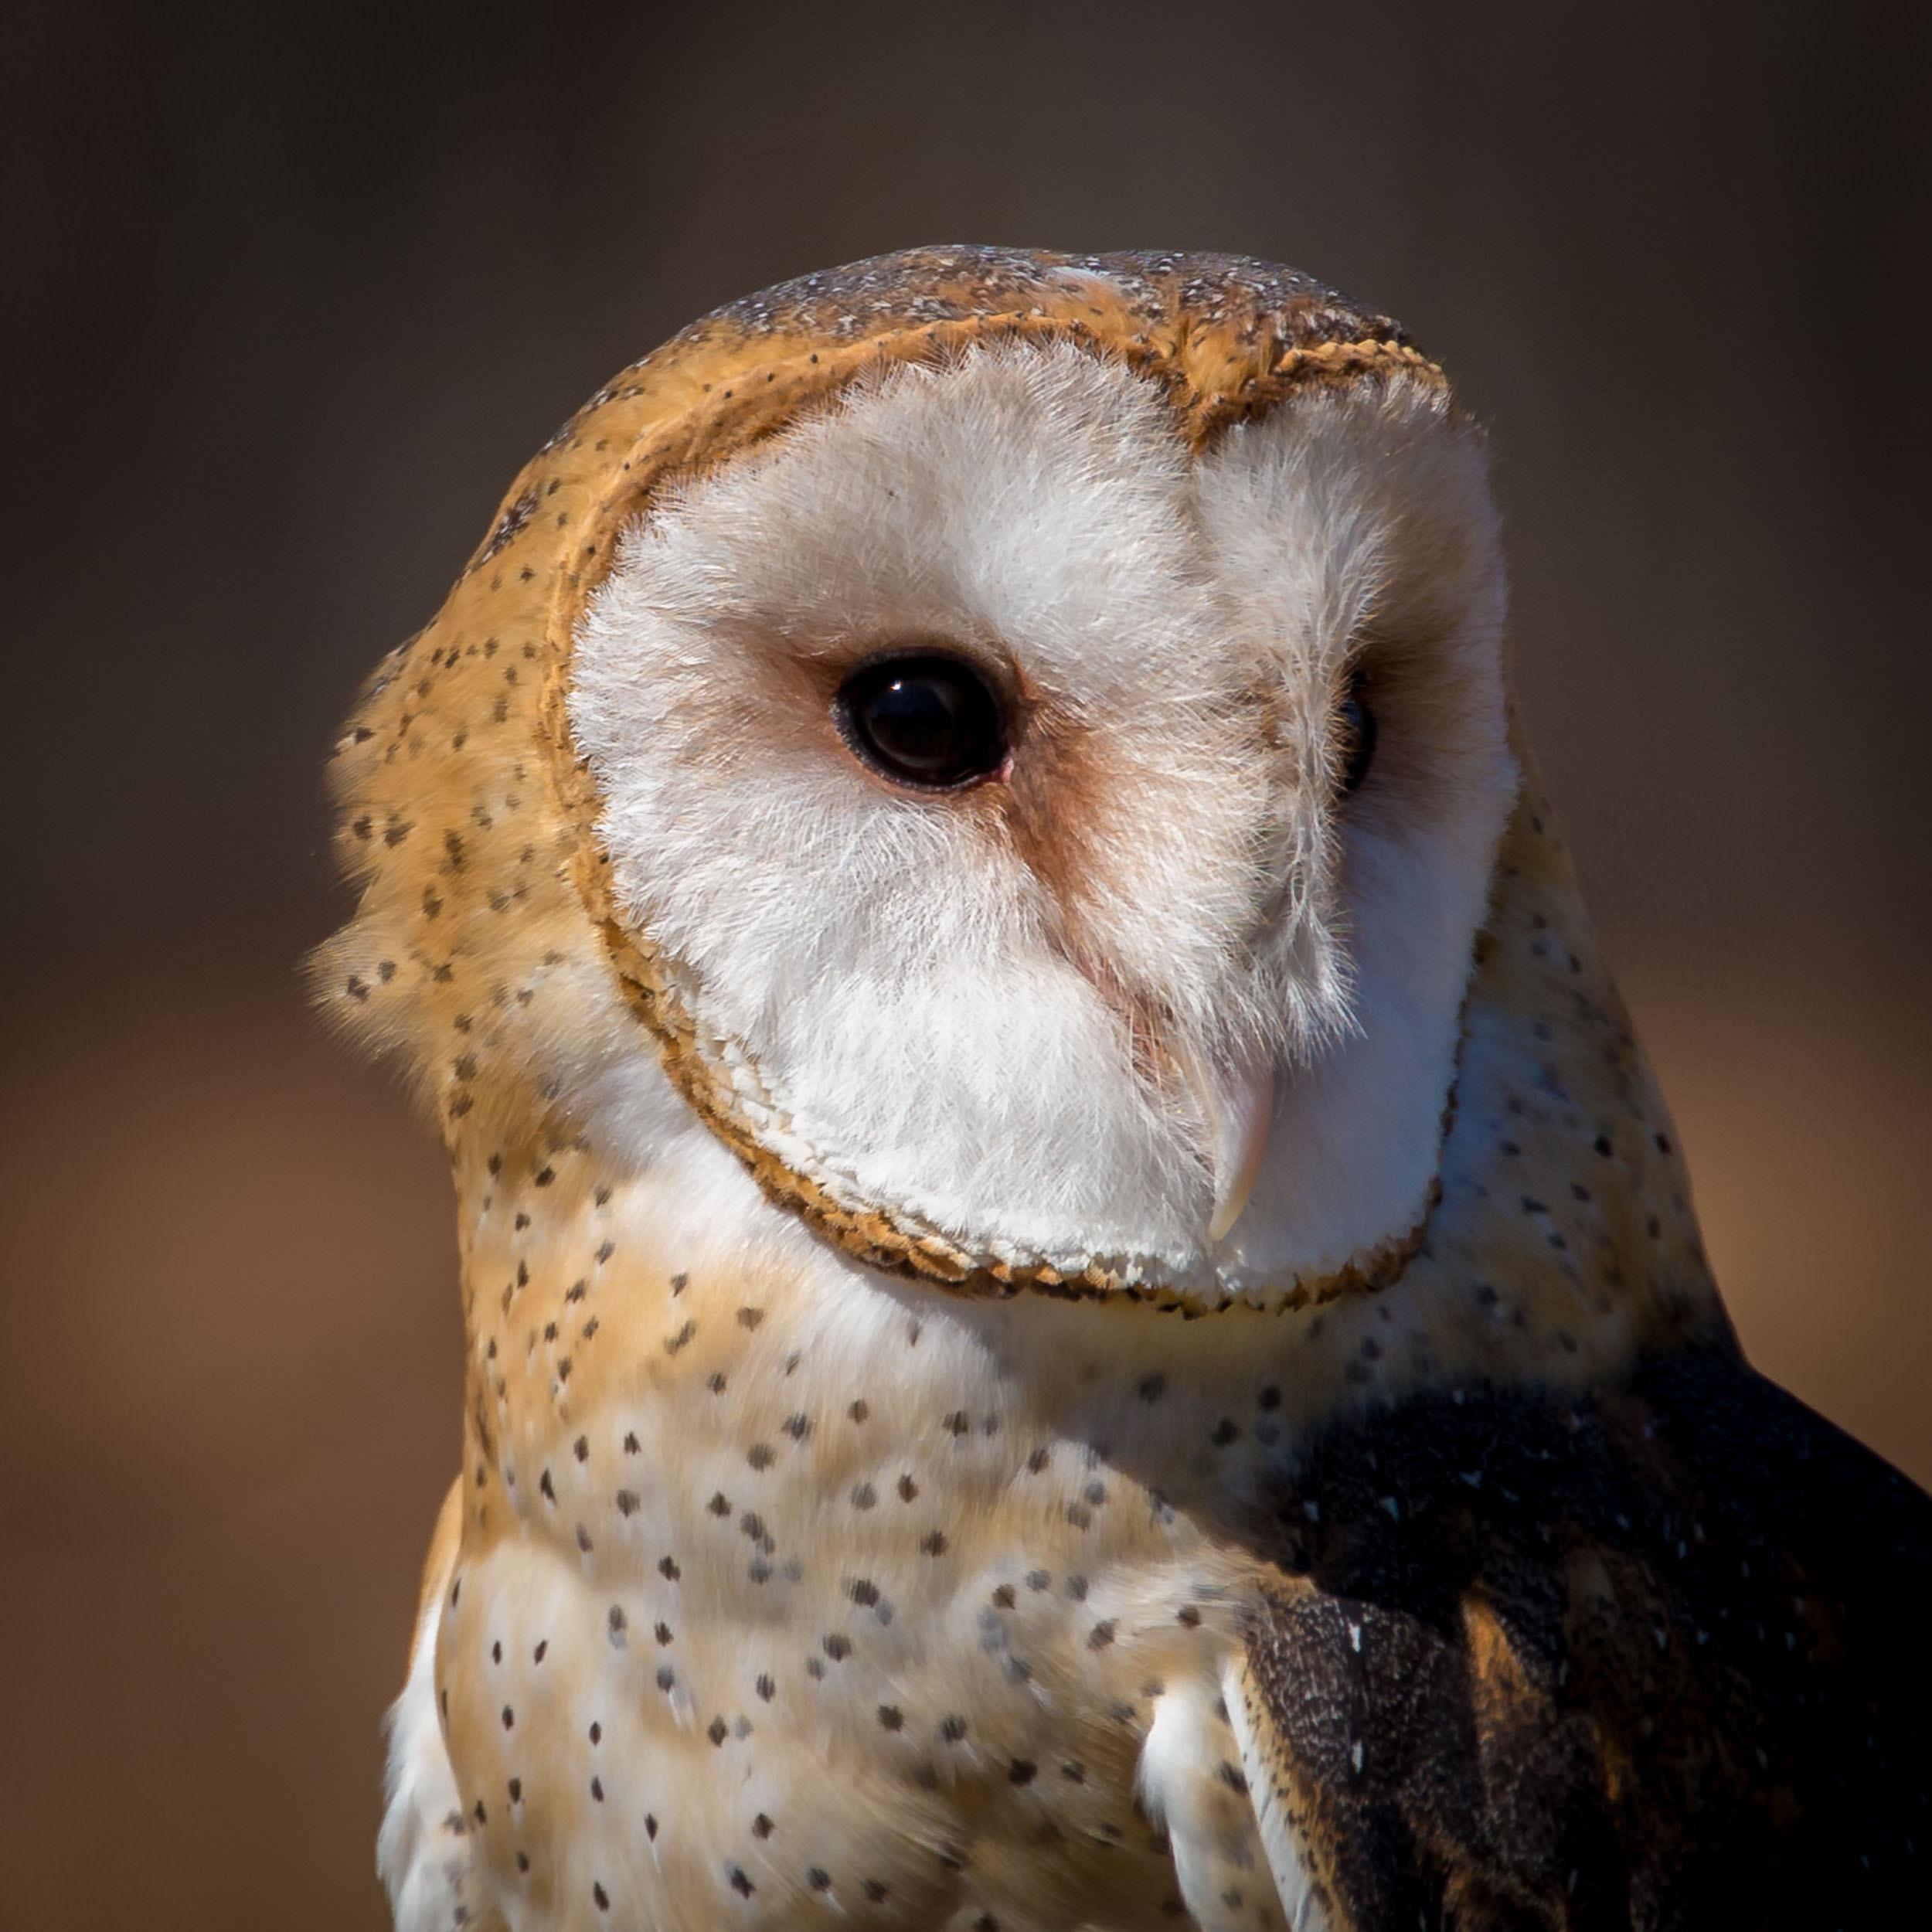 Niña, a Barn Owl at the Raptor Trust